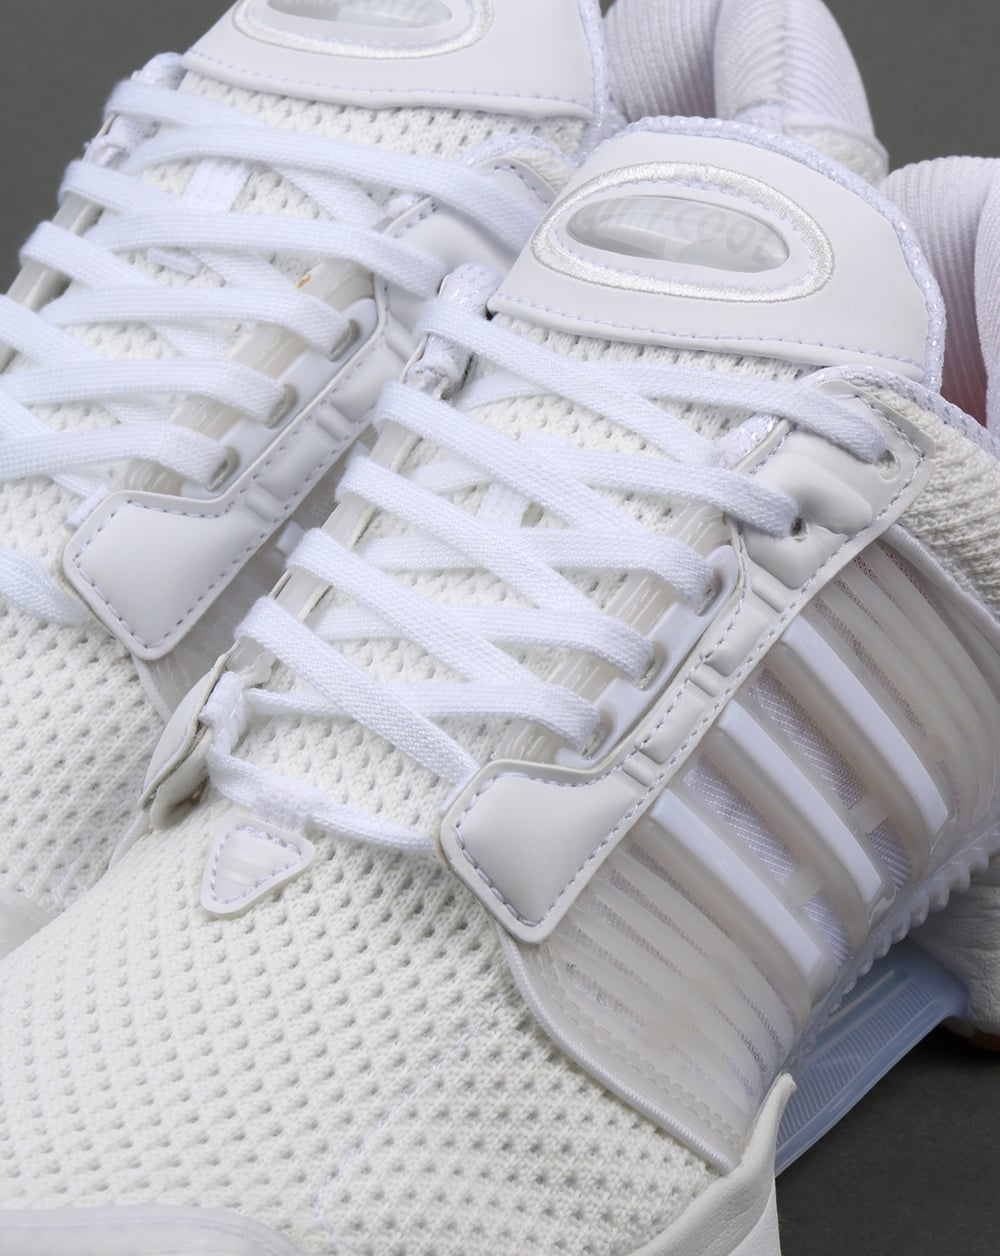 Adidas Climacool 1 Trainers WhiteGum